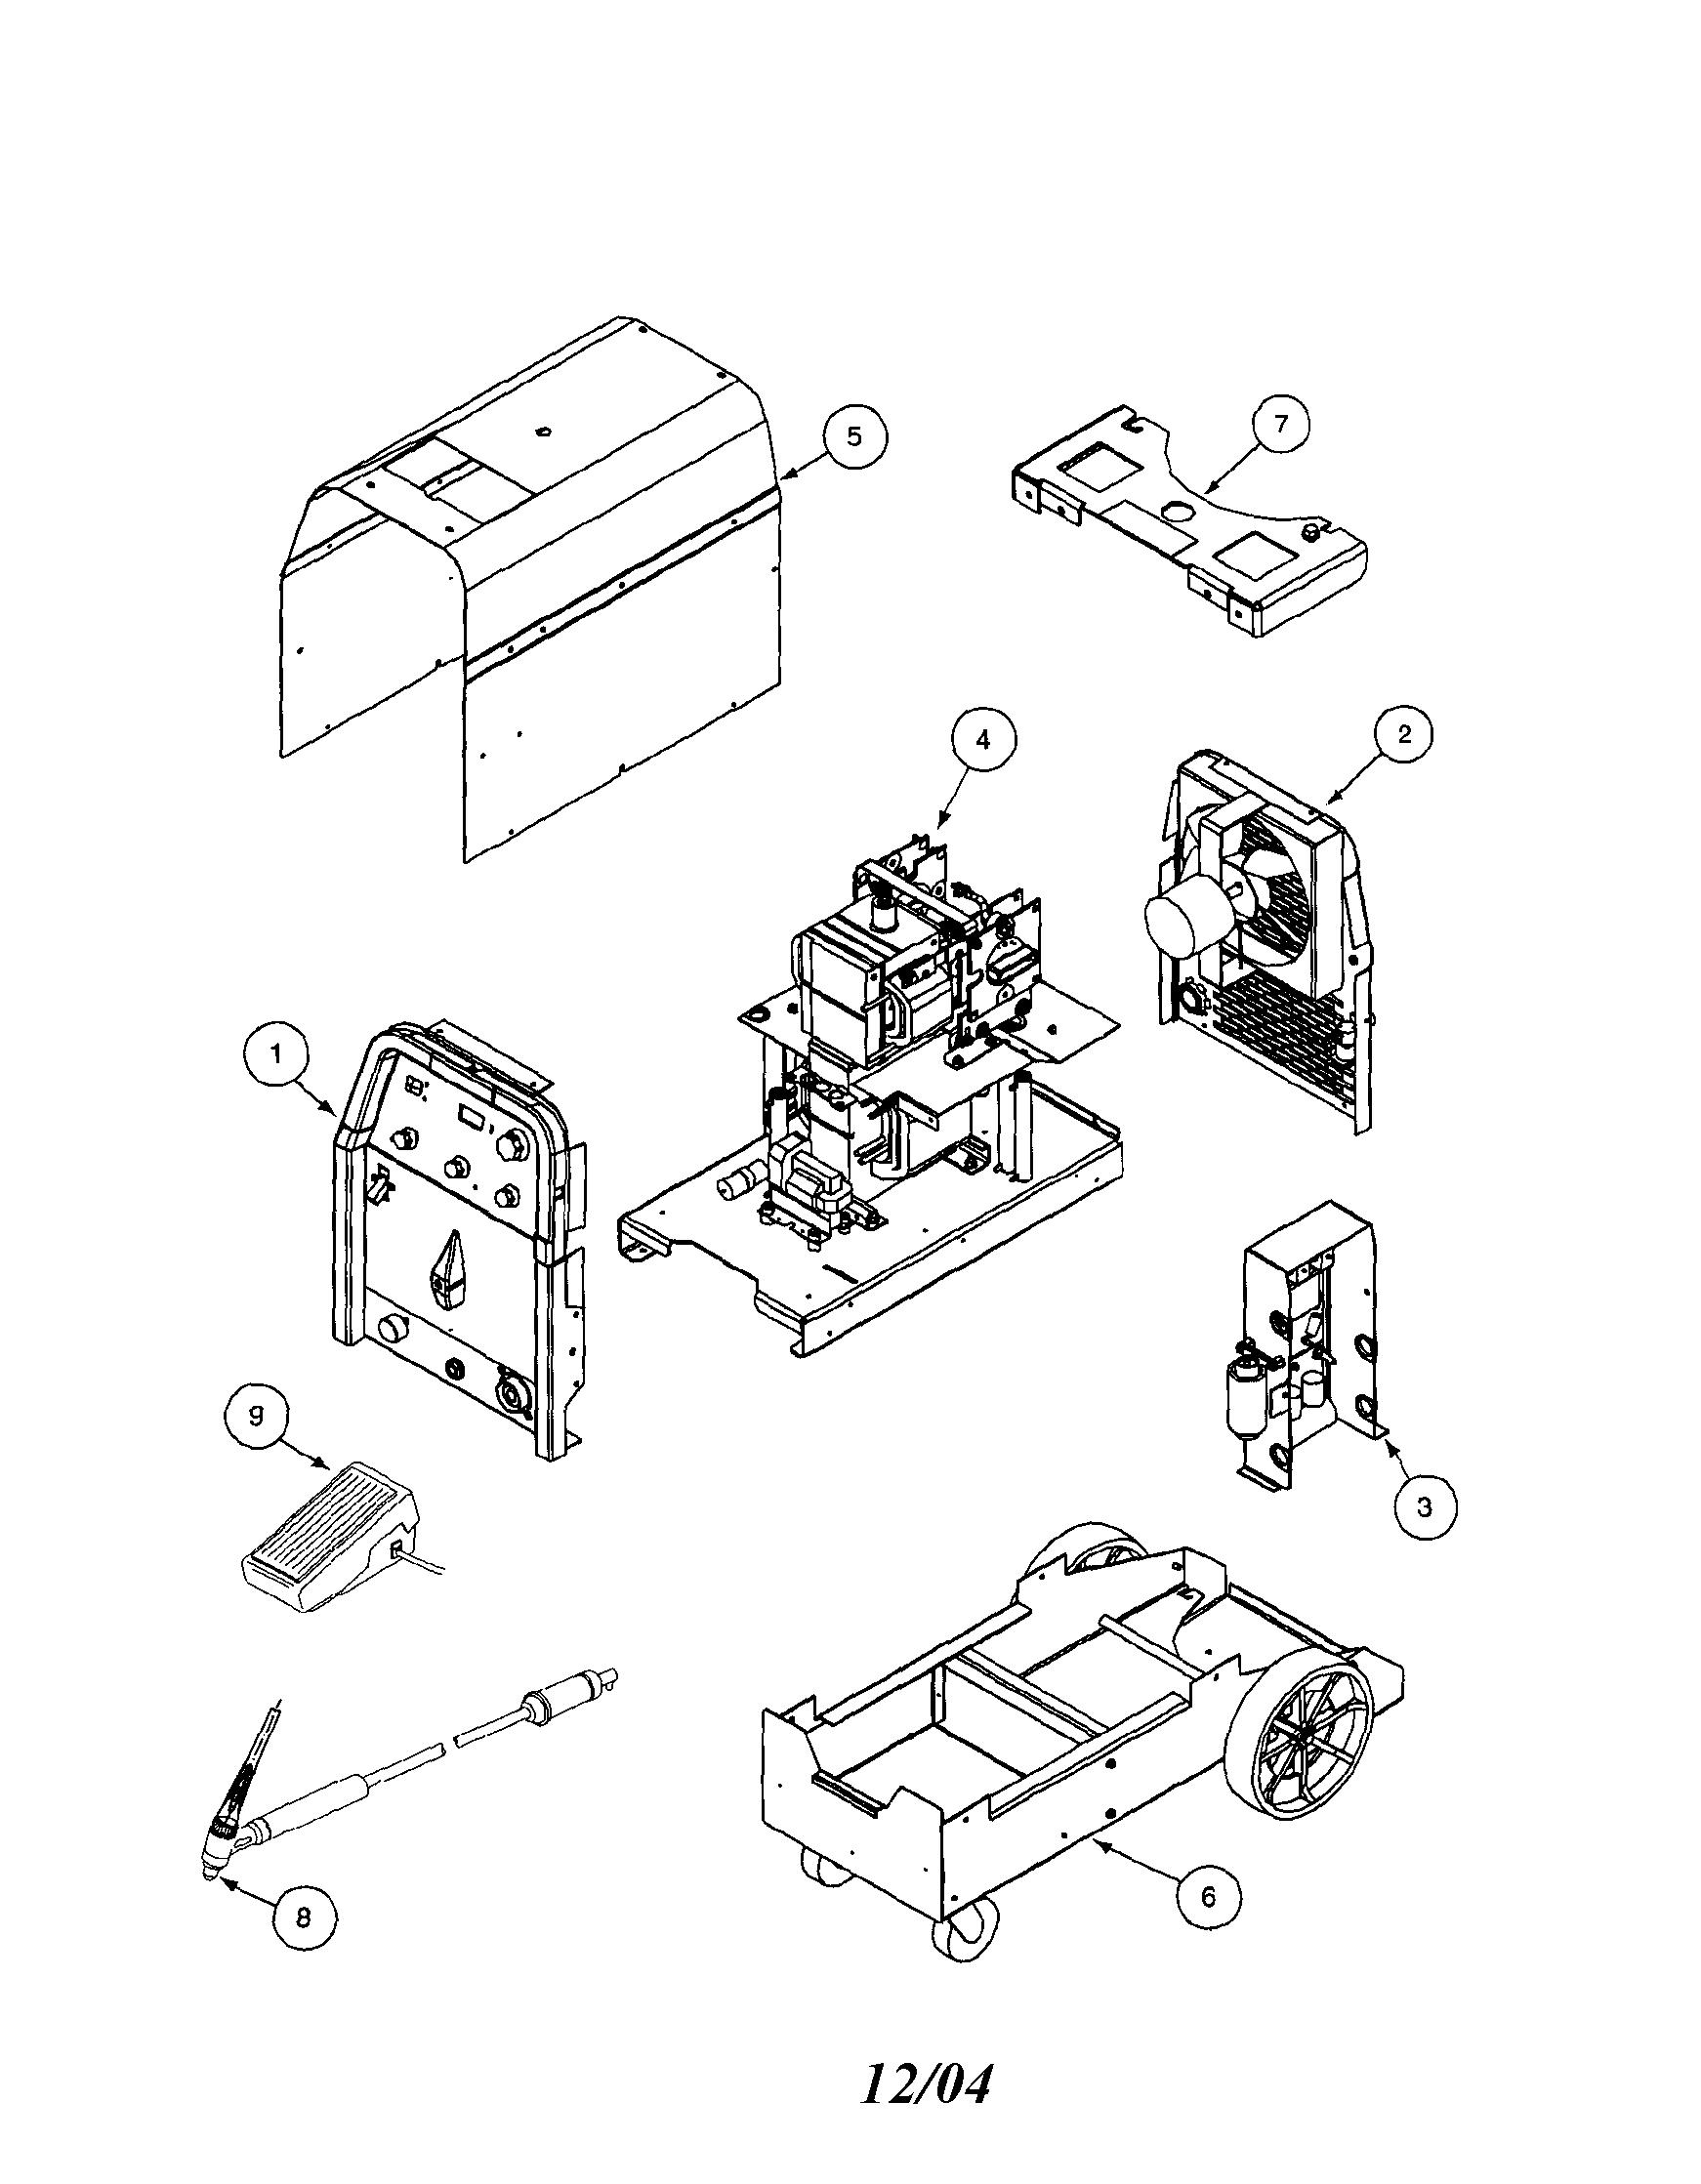 lincoln parts diagrams wiring diagrams bib lincoln parts diagrams [ 1742 x 2237 Pixel ]